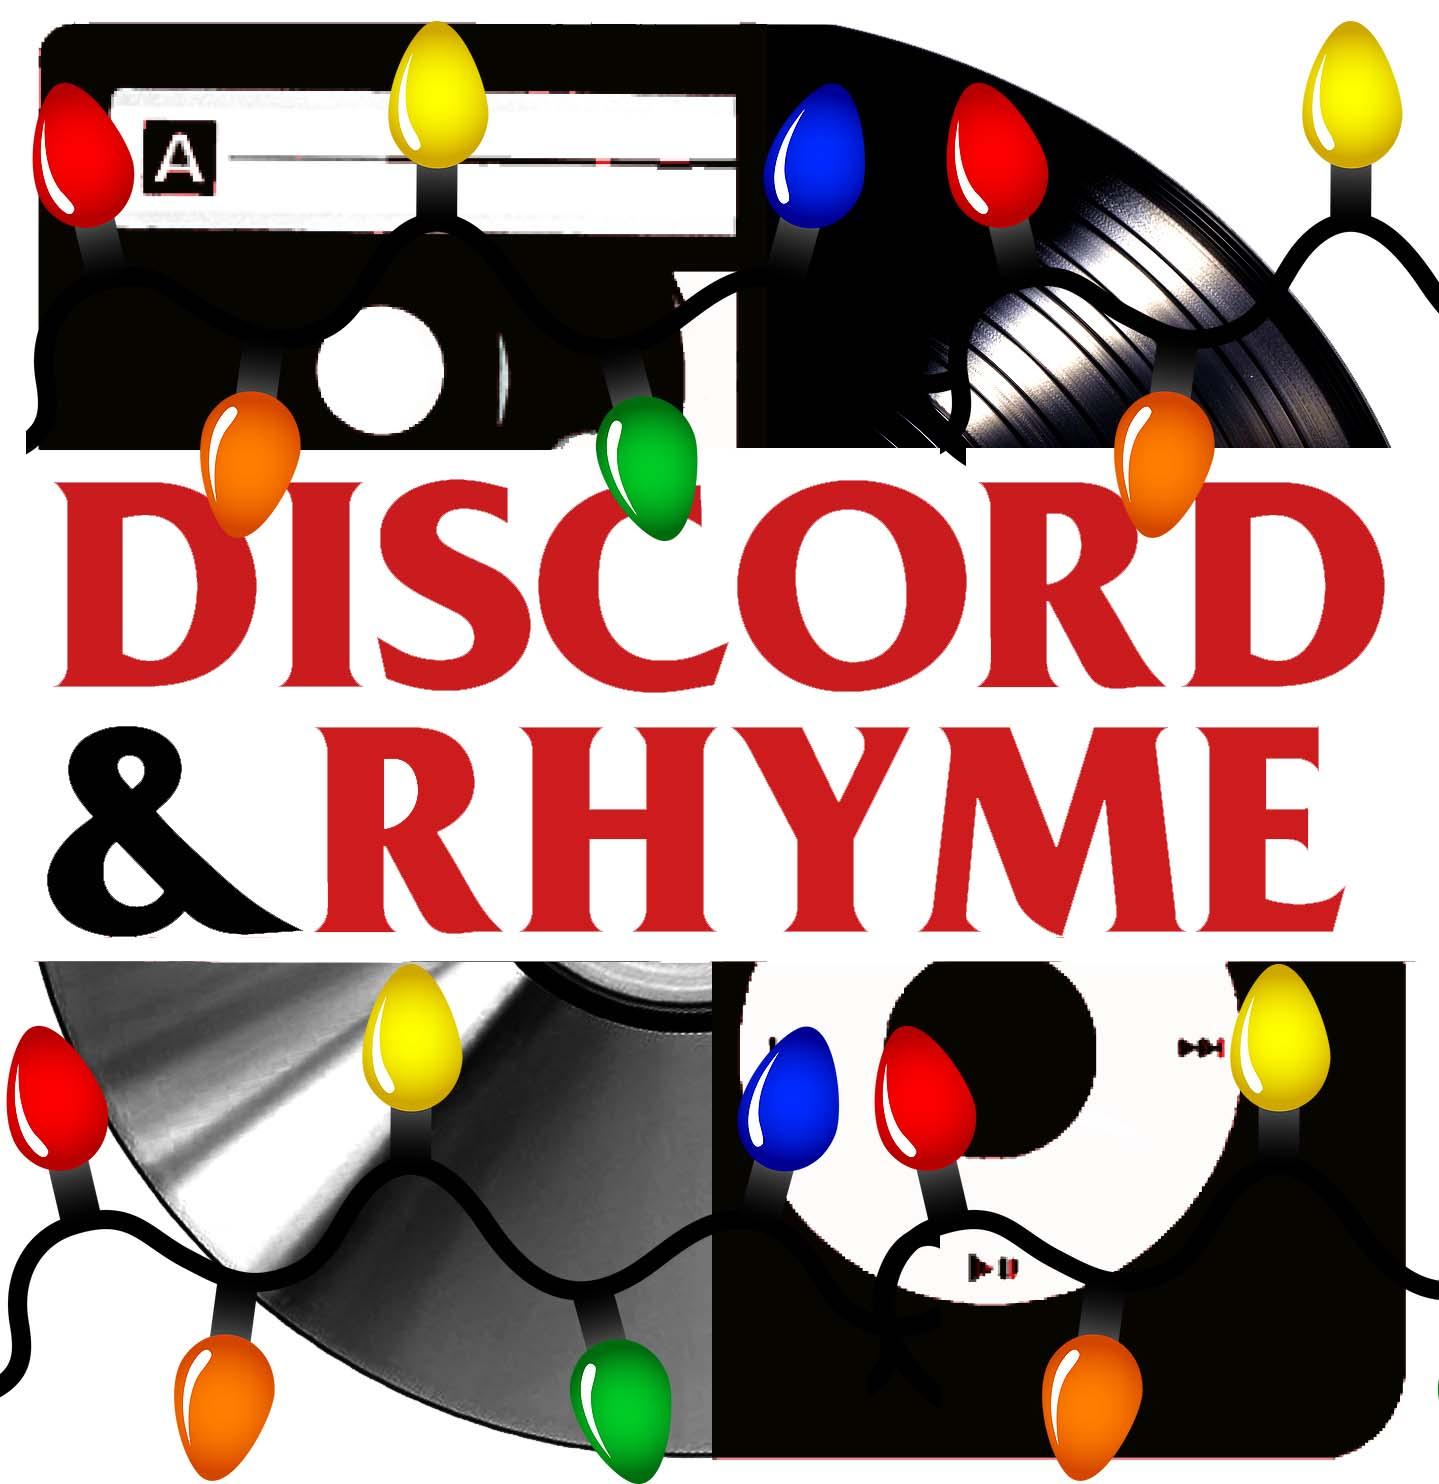 Christmas Discord Logo.Simply Having A Wonderful Discord Rhyme Discord Rhyme